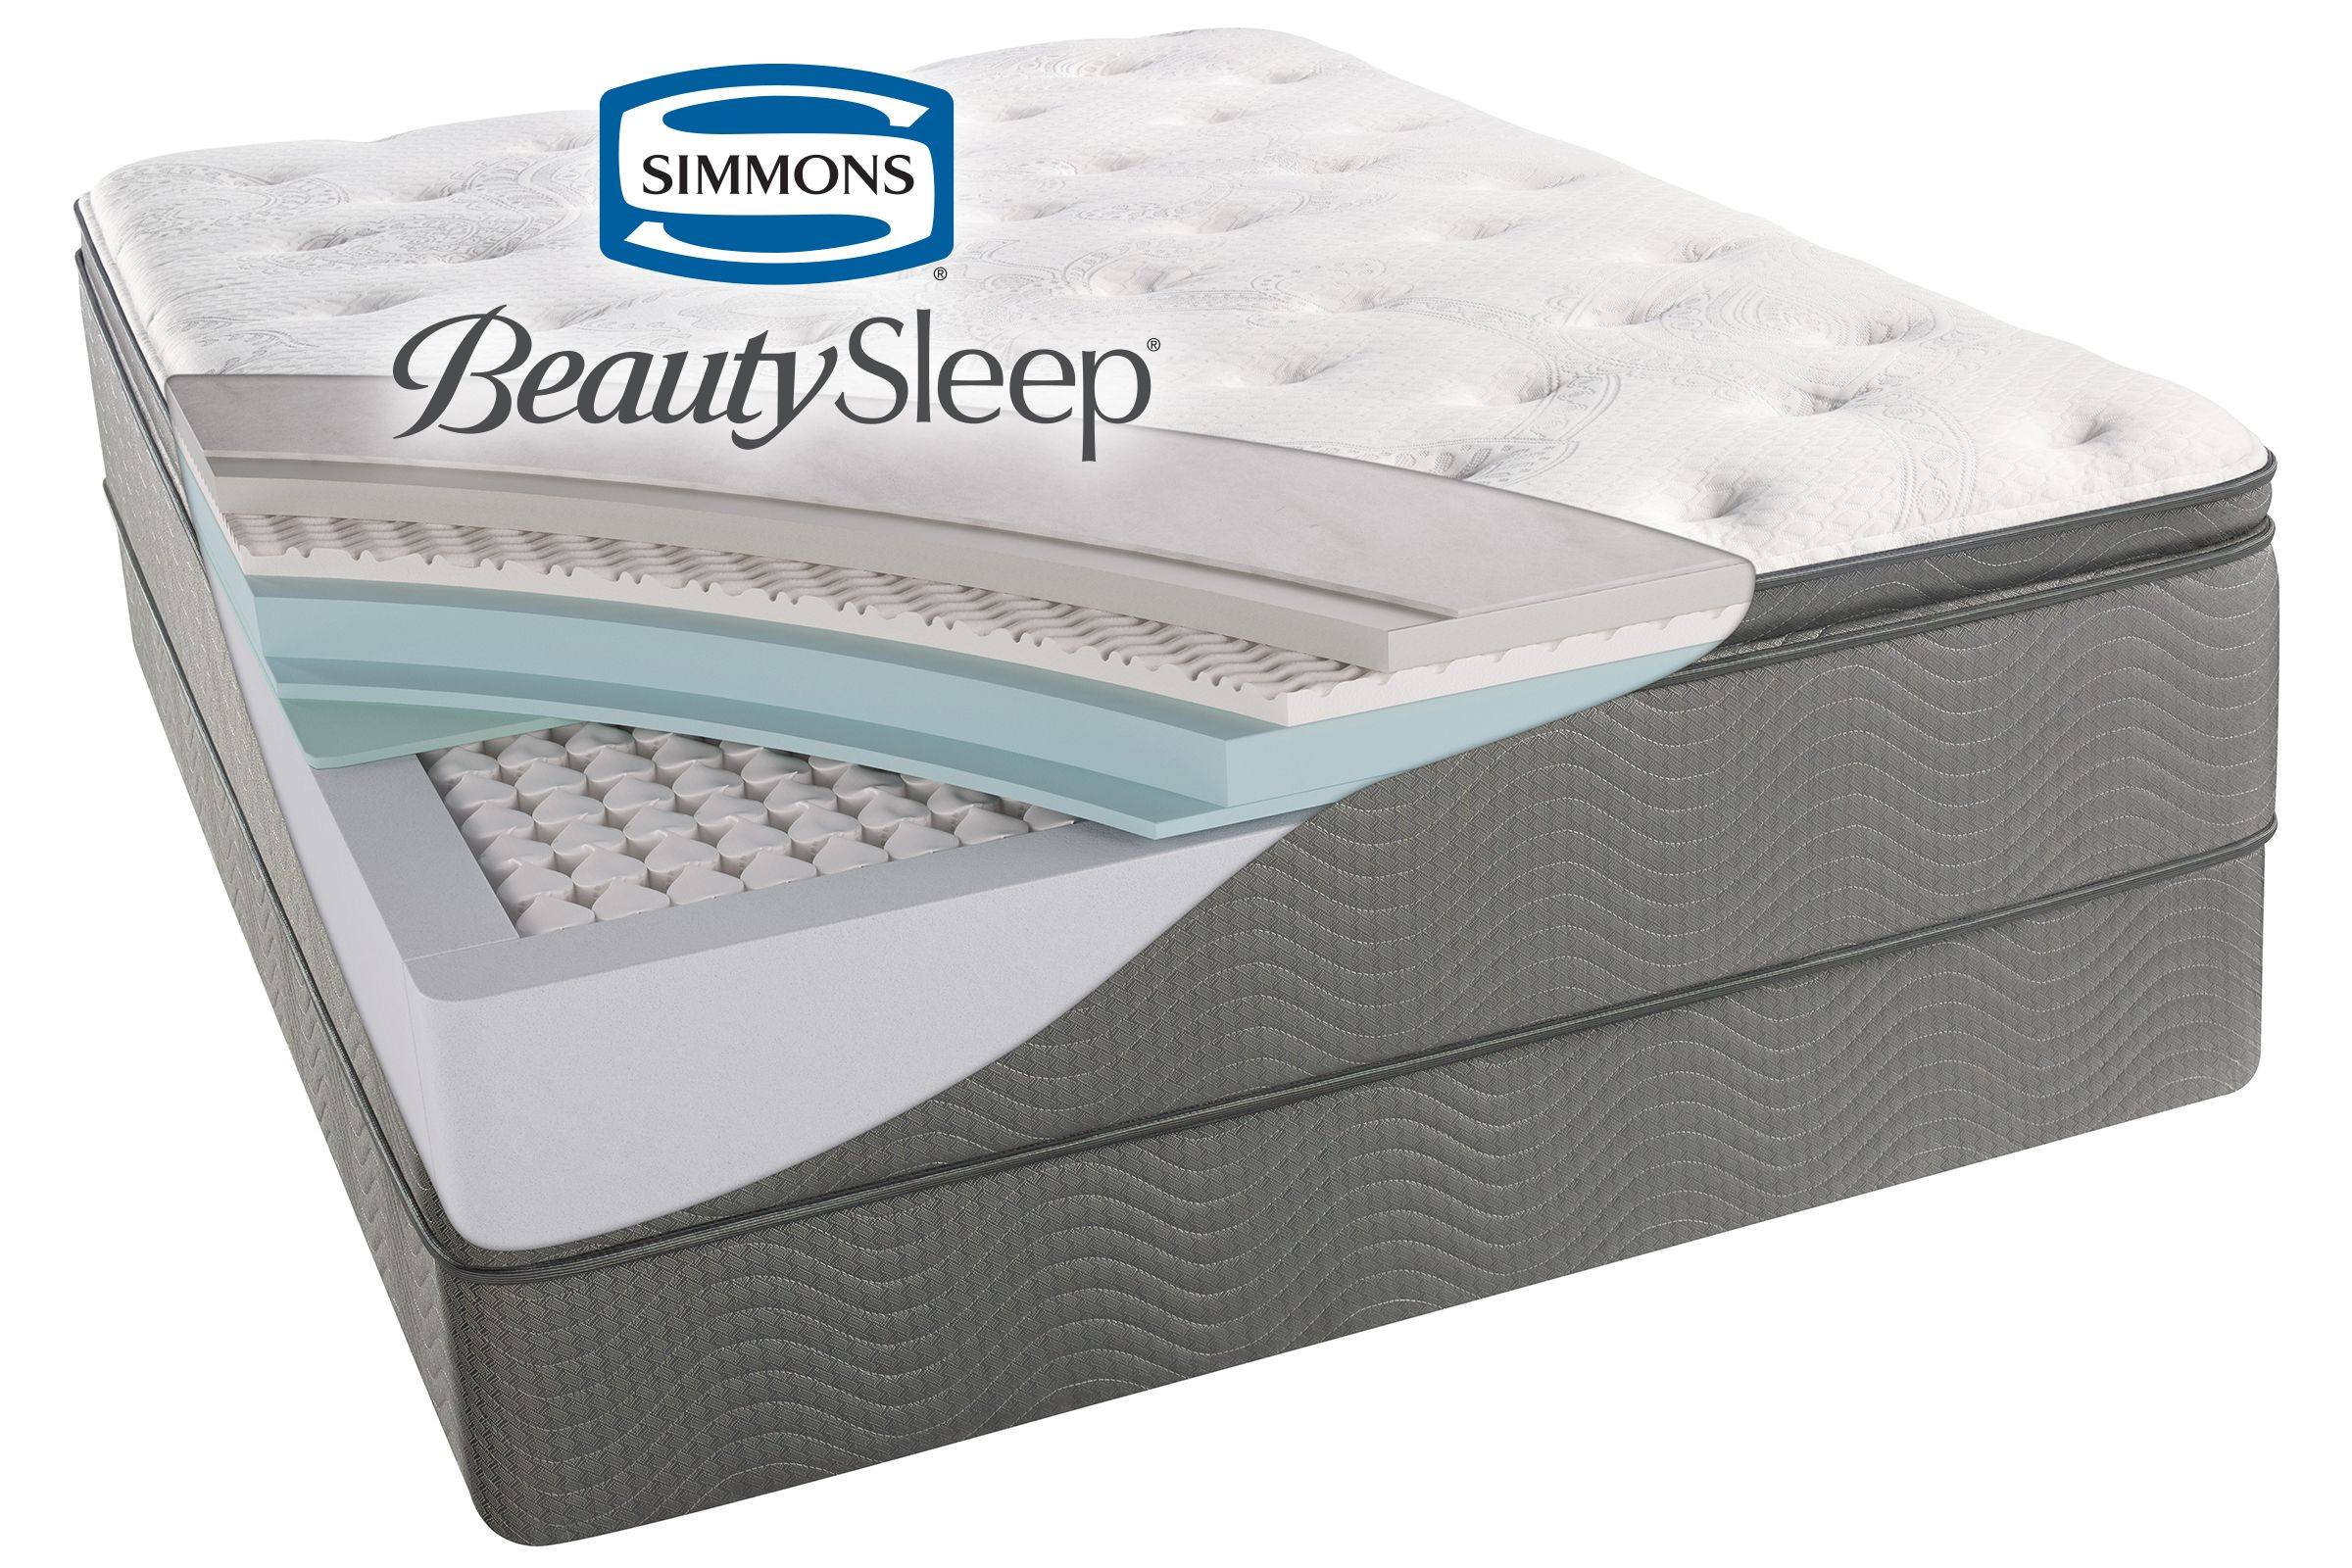 Simmons Beautysleep Sun Valley Plush Pillow Top King Mattress